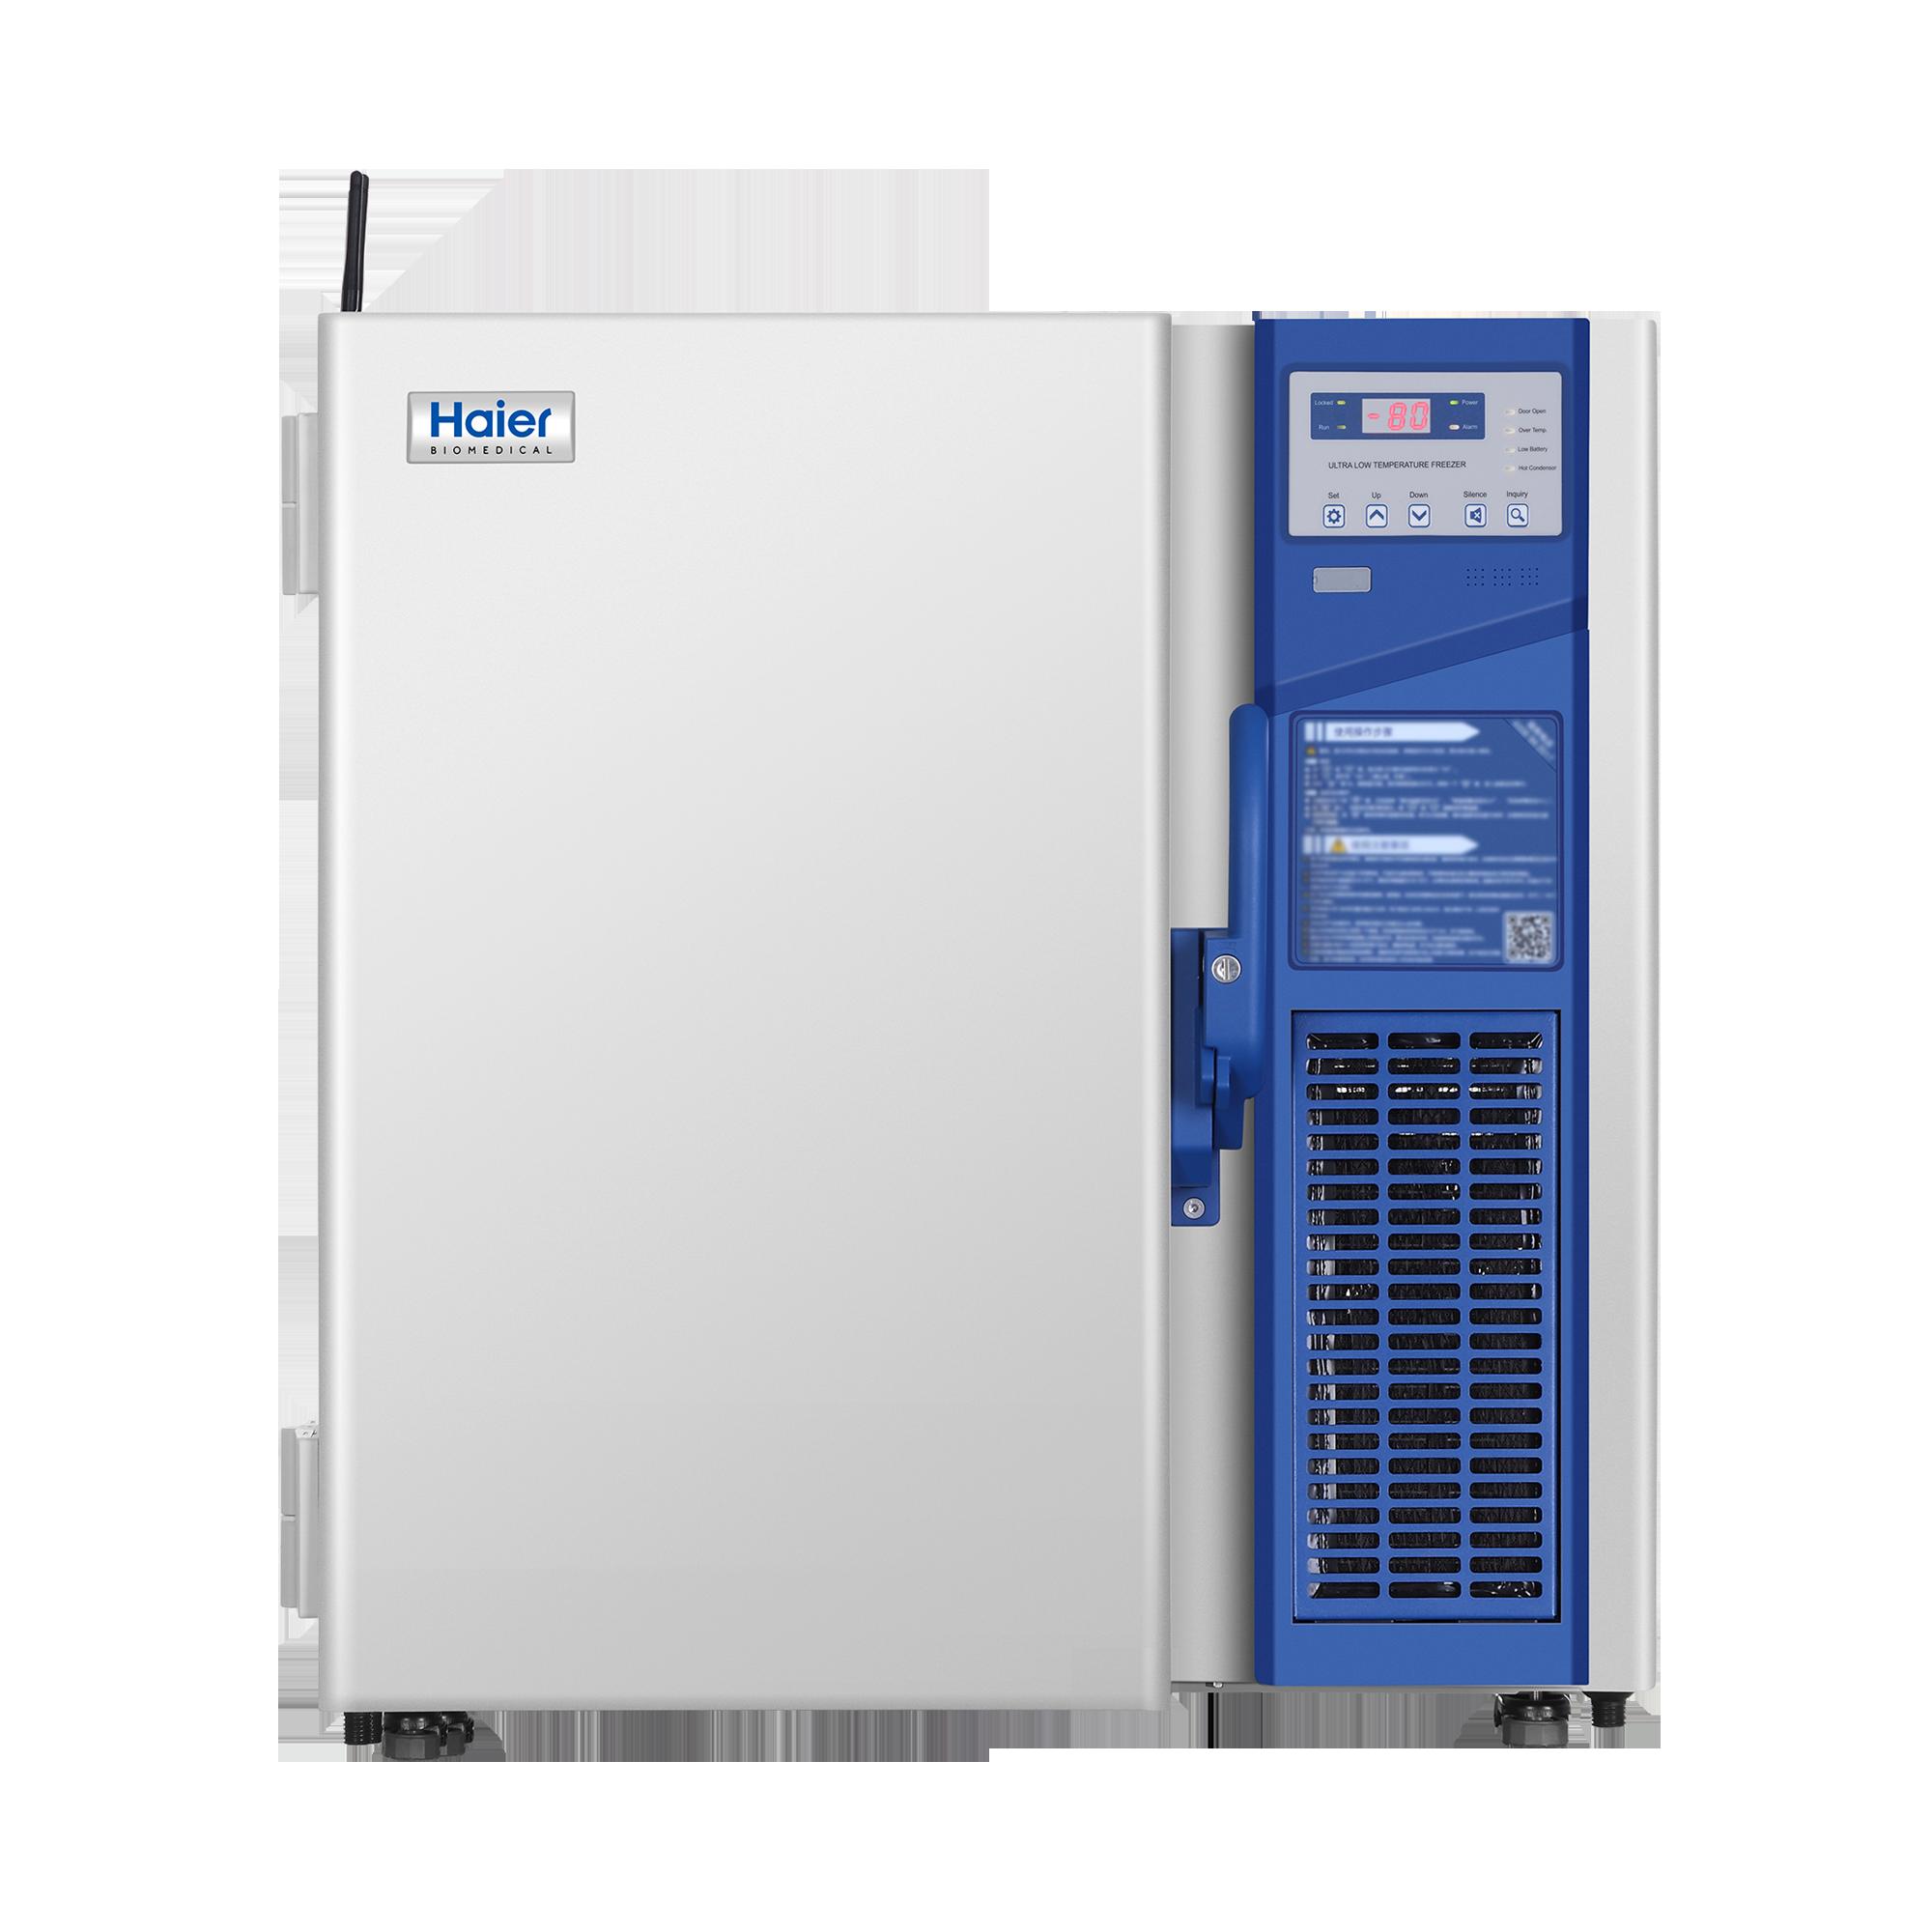 Haier DW-86L100J Upright ULT Freezer